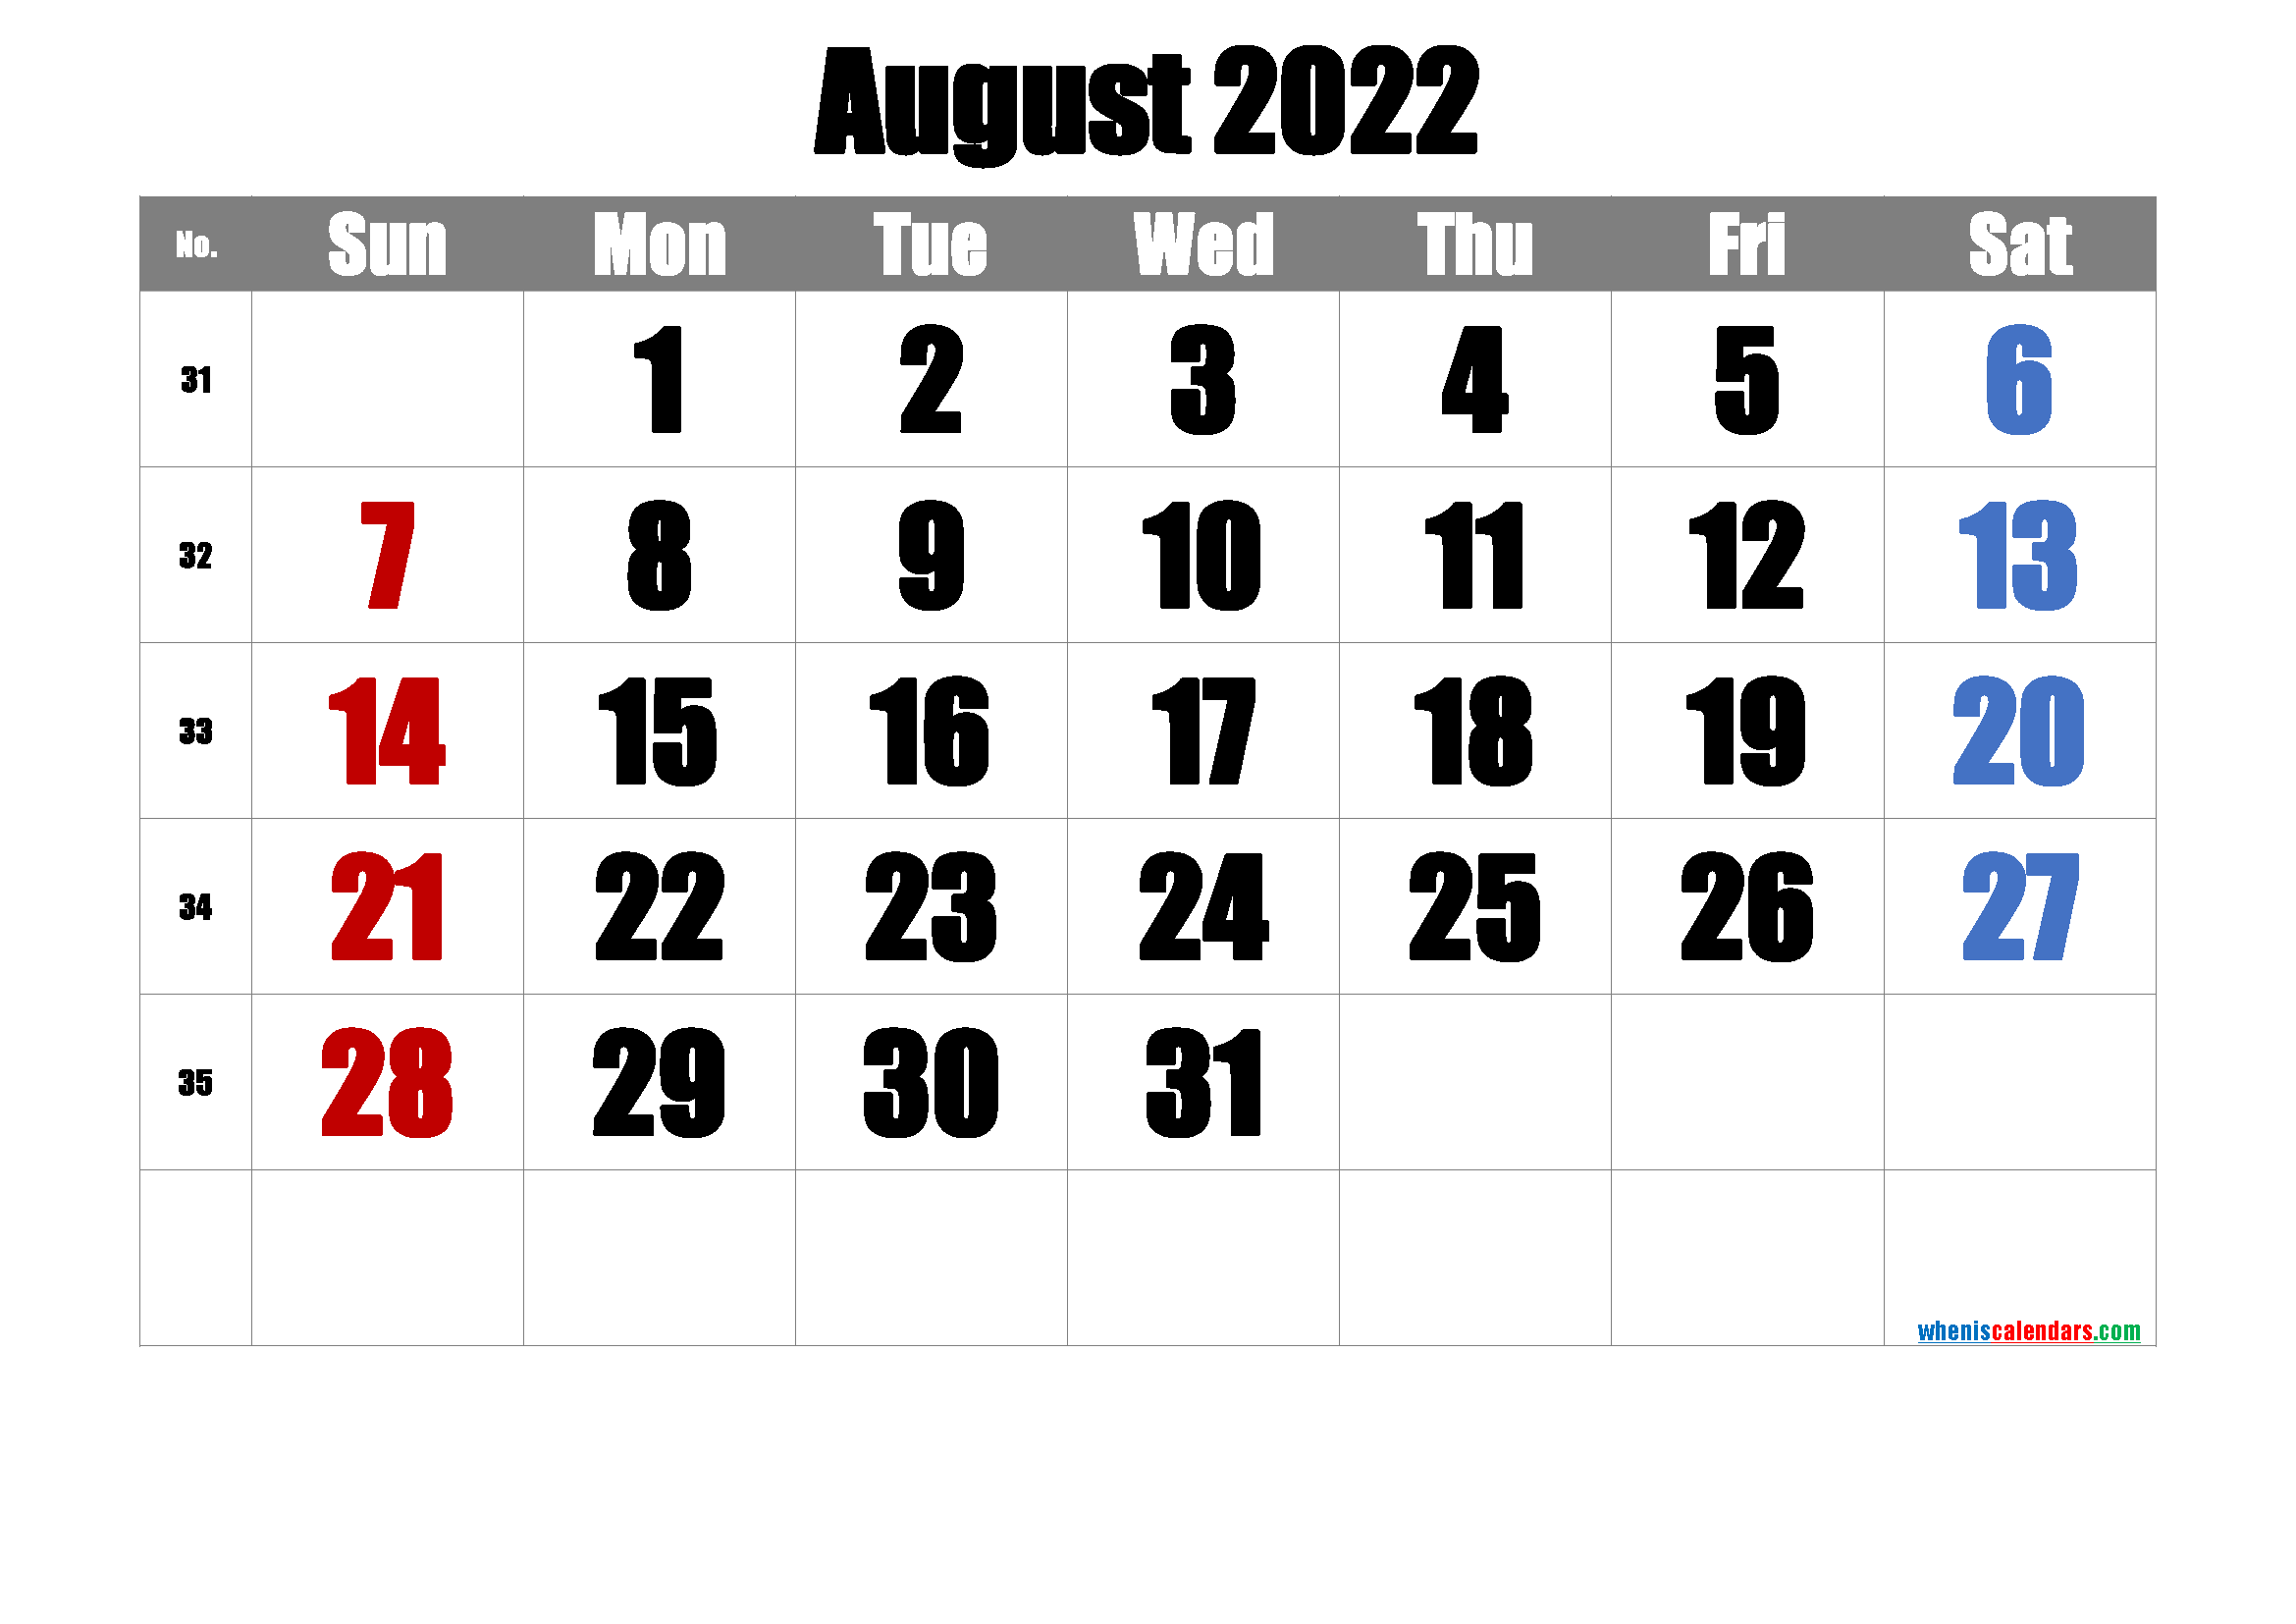 August 2022 Calendar Printable.Free Printable August 2022 Calendar Pdf And Png Calendar Printables March Free Printable Calendar Printable Calendar